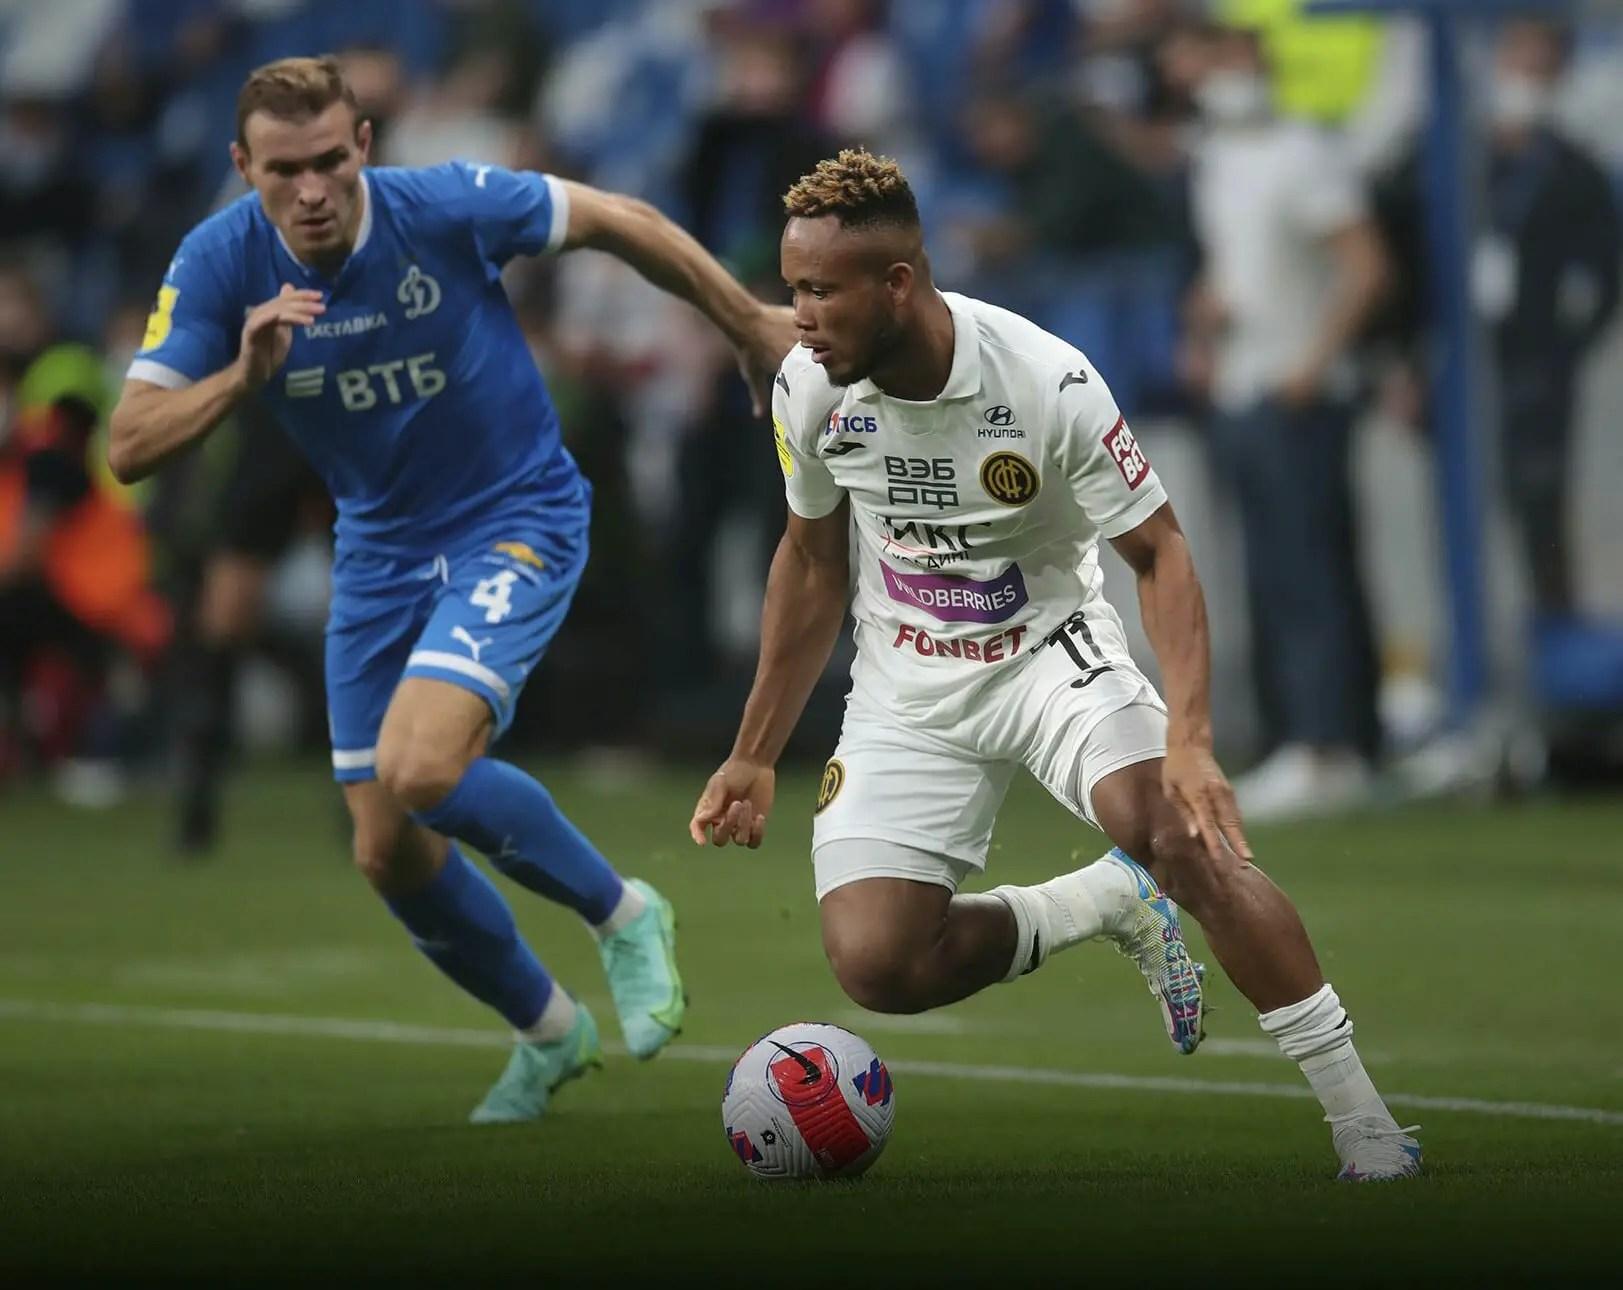 Russian League: Ejuke's Goal Not Enough As CSKA Suffer Defeat Again